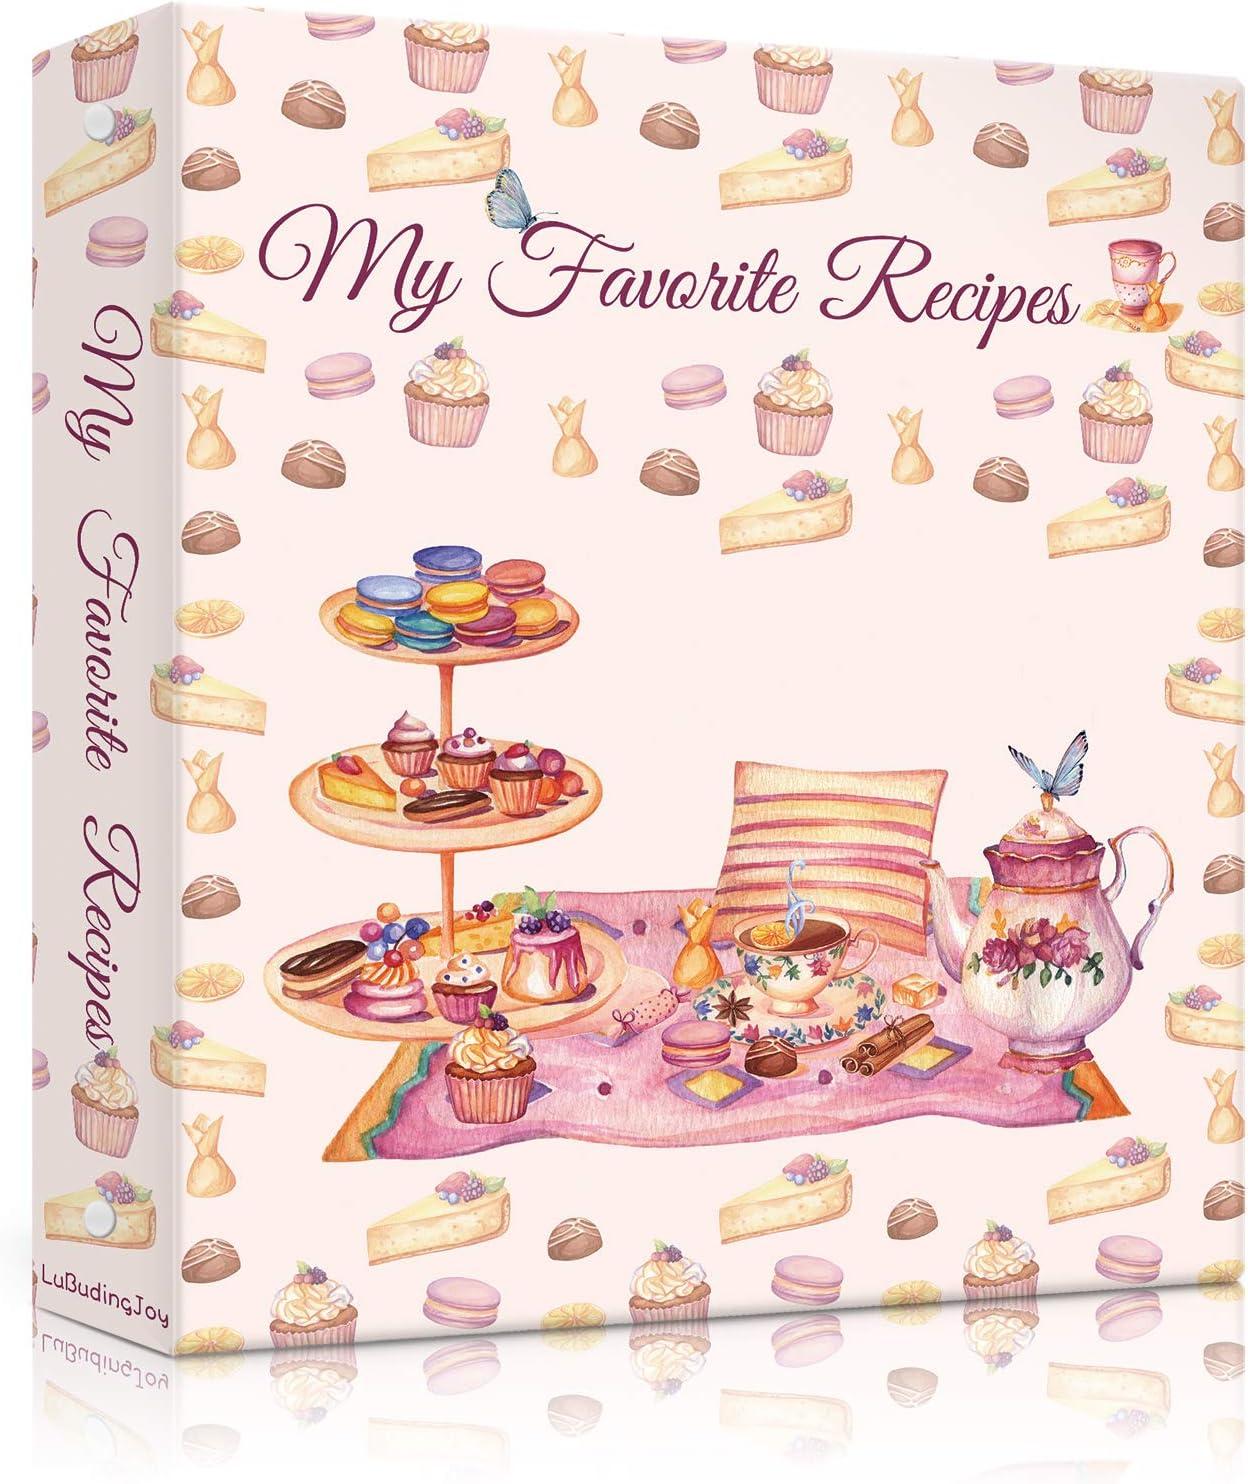 Lubudingjoy Recipe Book Binder, Hardcover 3 Ring Binder Cookbook Binder for Recipes, Create Your Recipe Binders, Recipe Binder with Cards, Sleeves and Dividers (Delicious Desserts)